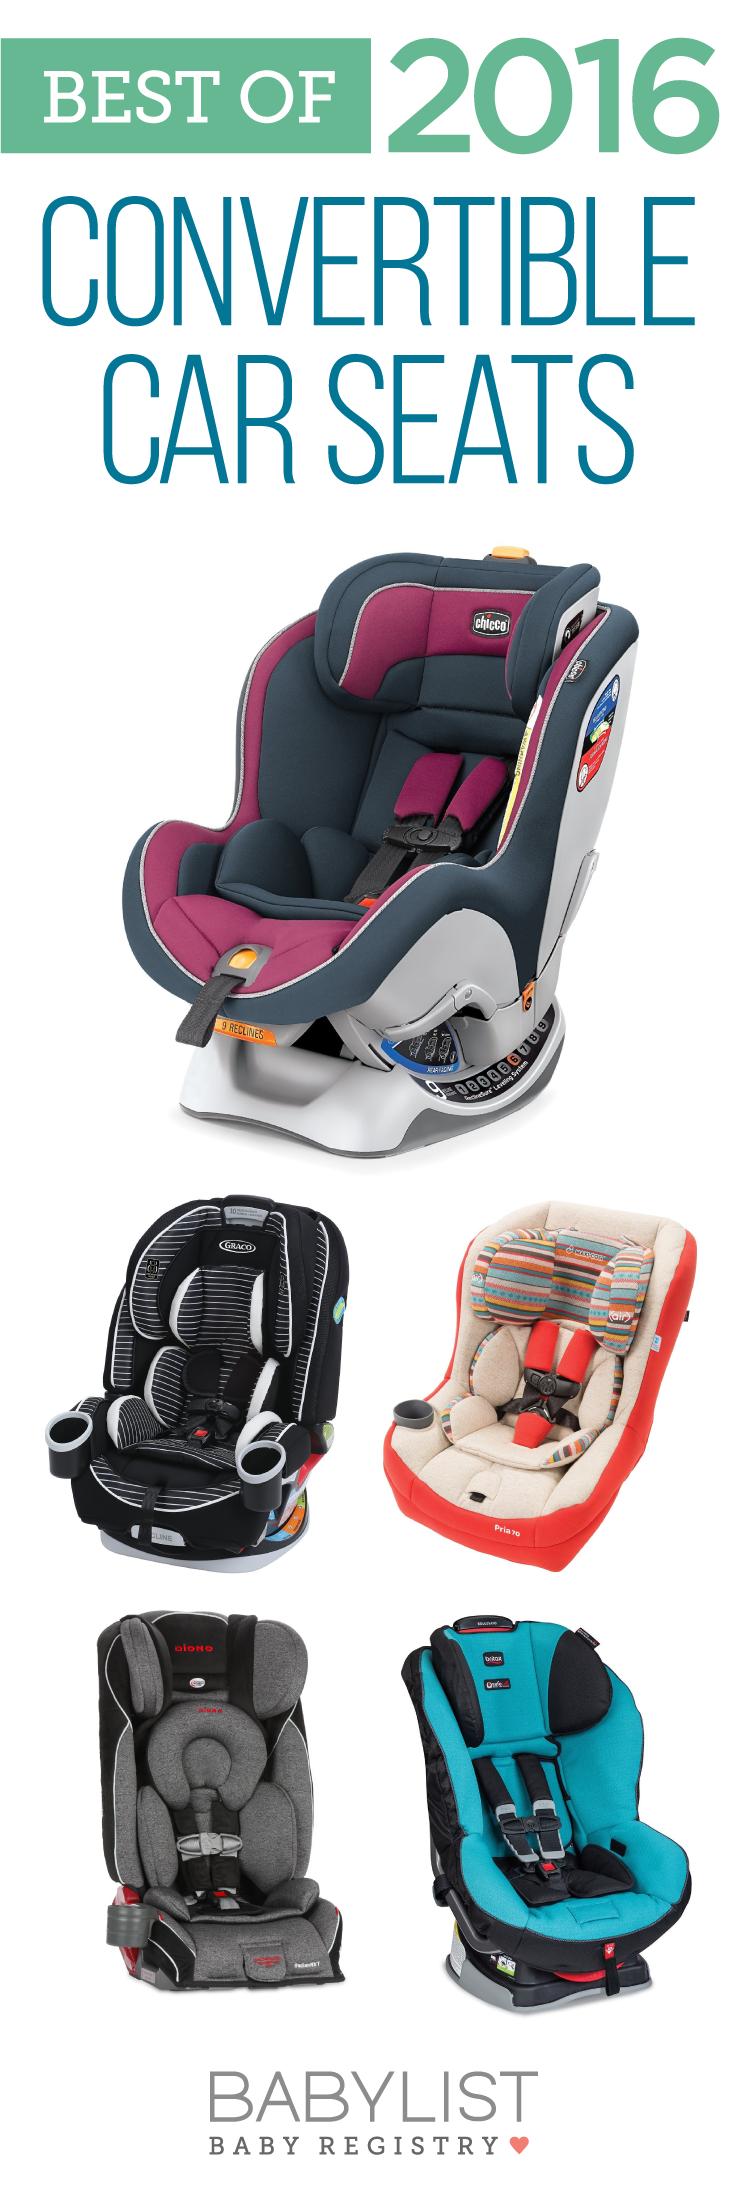 best convertible car seats of 2017. Black Bedroom Furniture Sets. Home Design Ideas